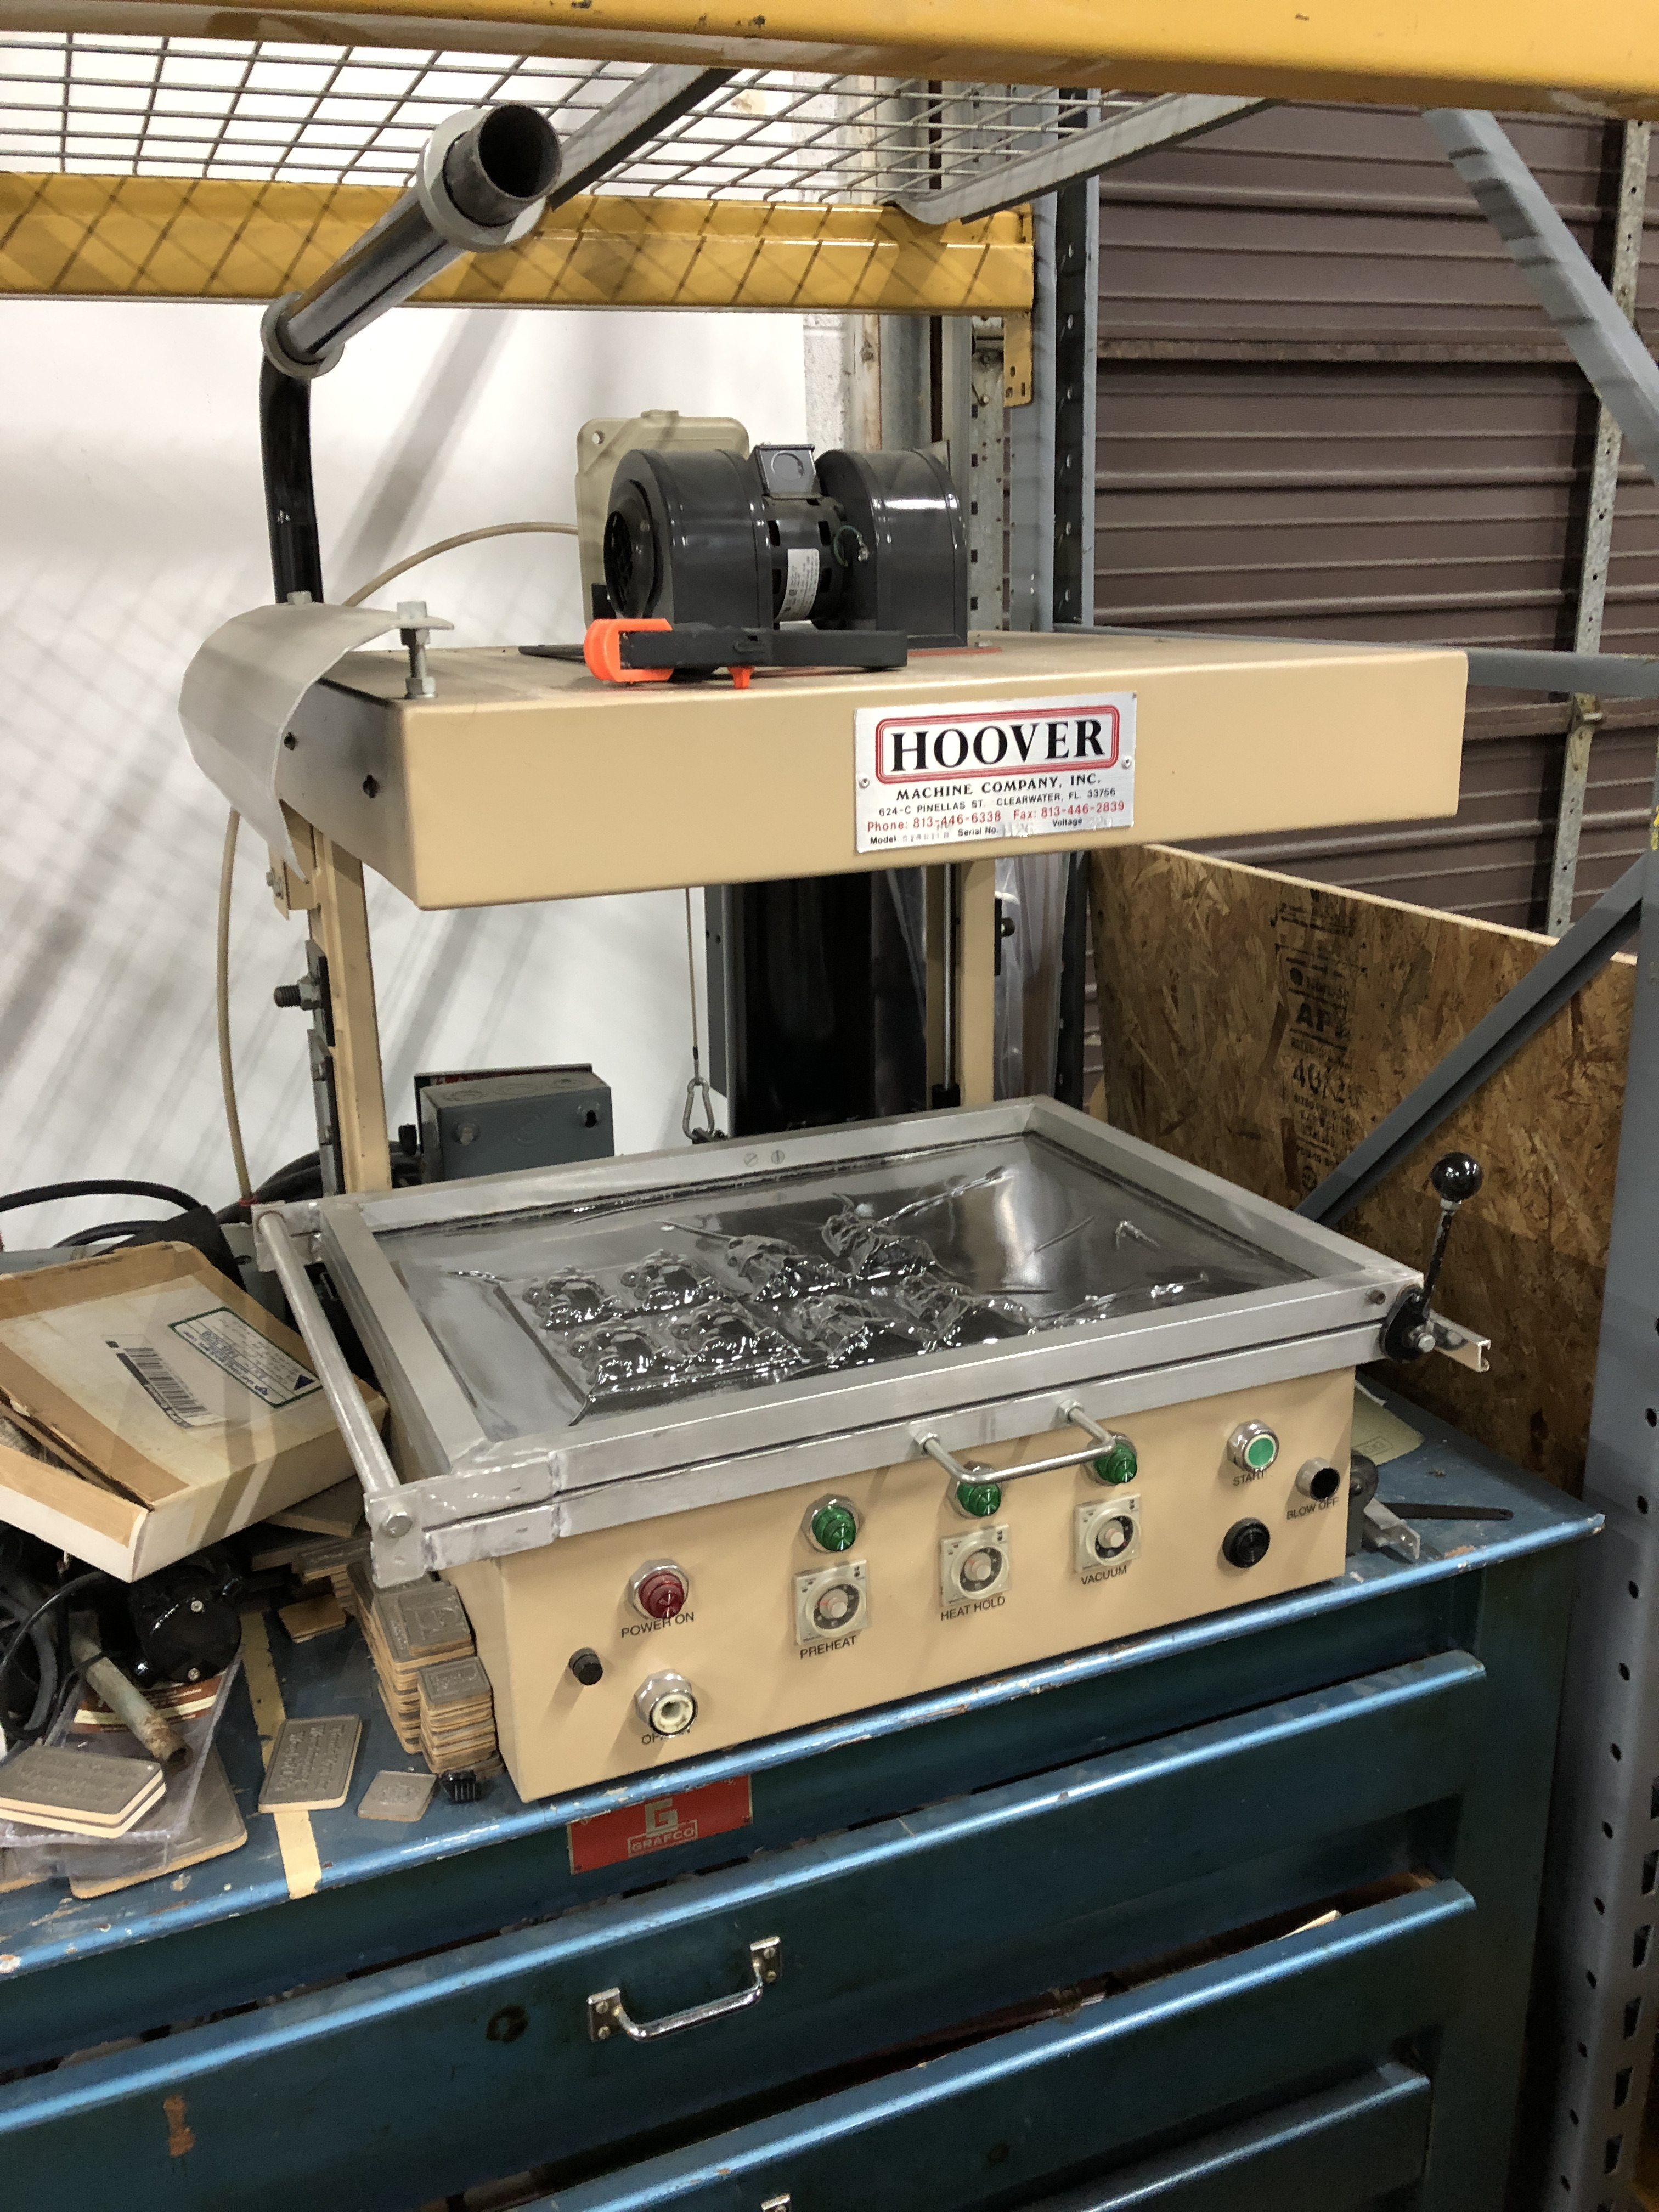 "Lot 45 - Hoover model Starter Thermoforming plastic mold making machine 18"" x 24"" range"